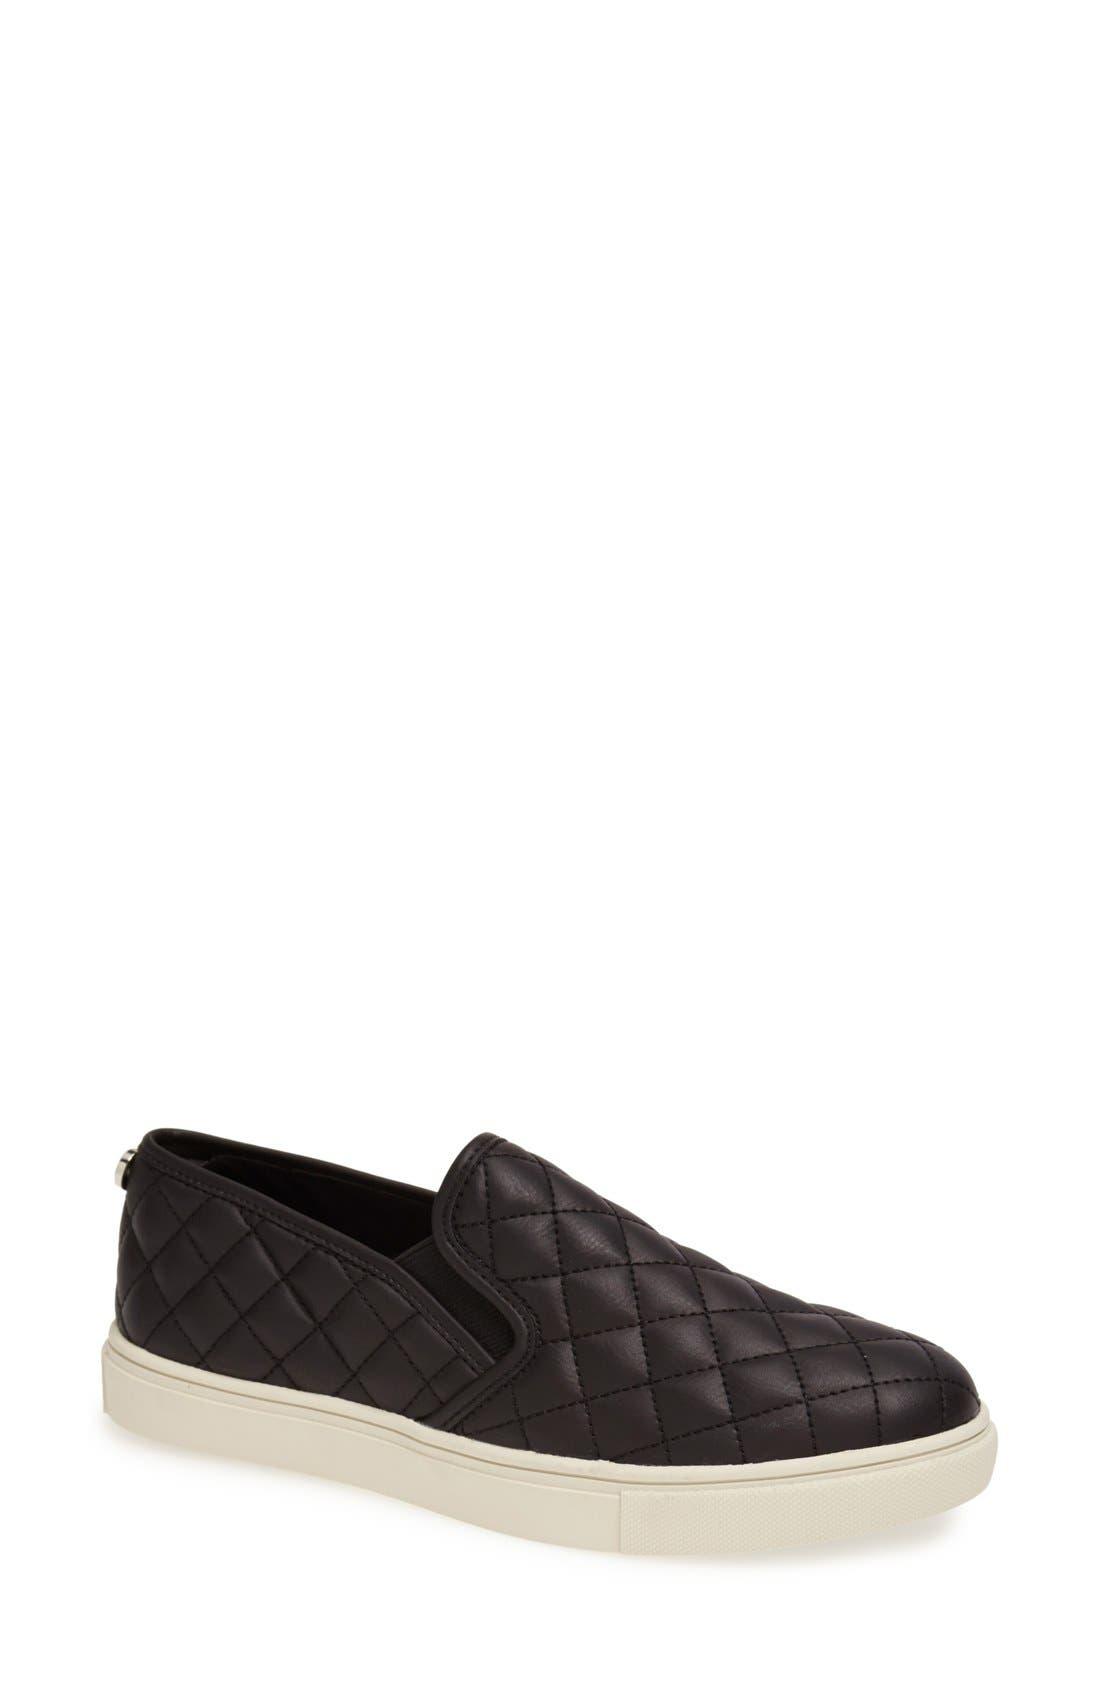 STEVE MADDEN, Ecentrcq Sneaker, Main thumbnail 1, color, BLACK FAUX LEATHER